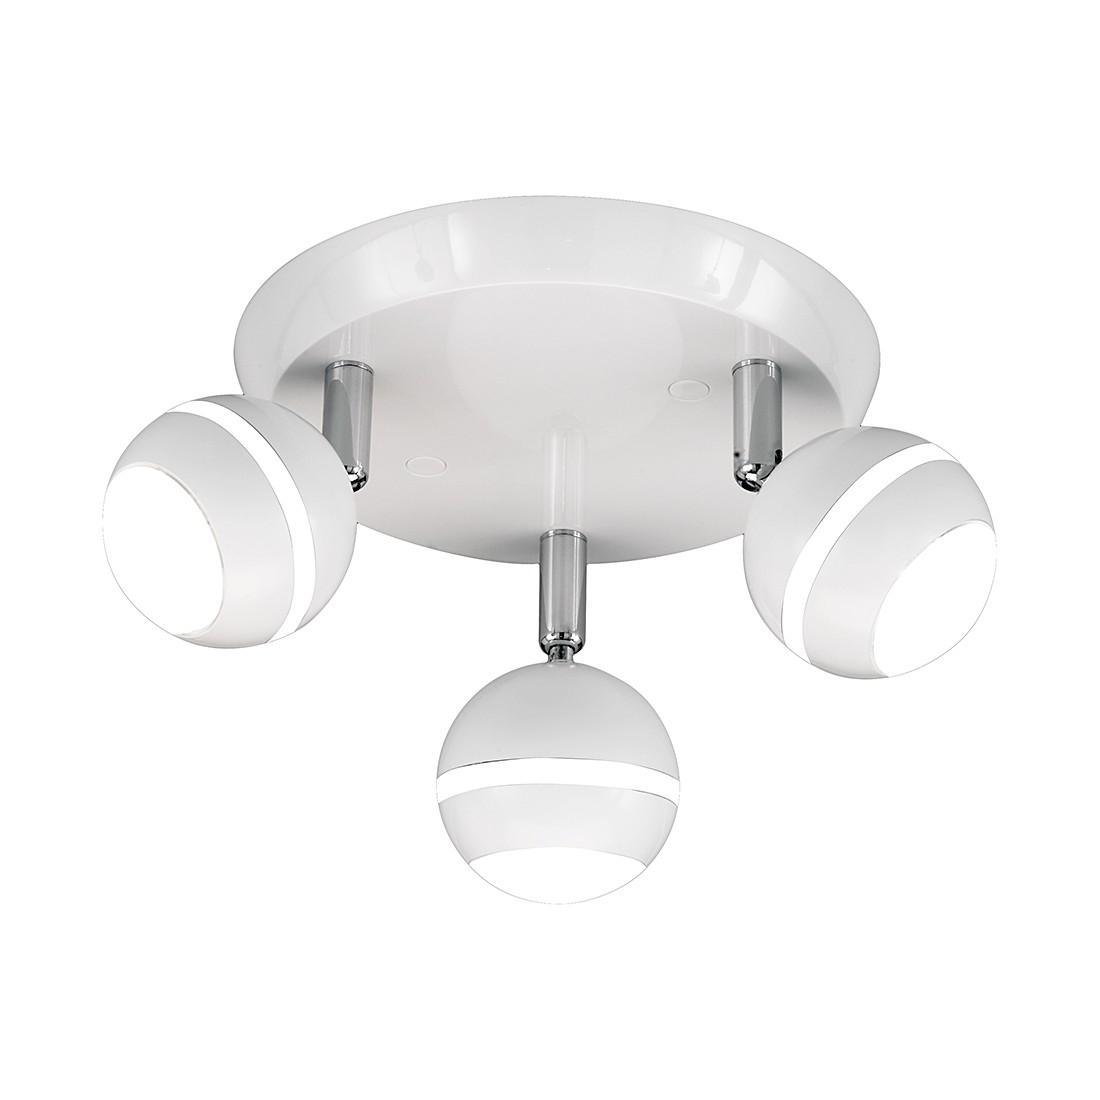 EEK A+, LED-Balken – Weiß – 3×4,2 W, Trio bestellen